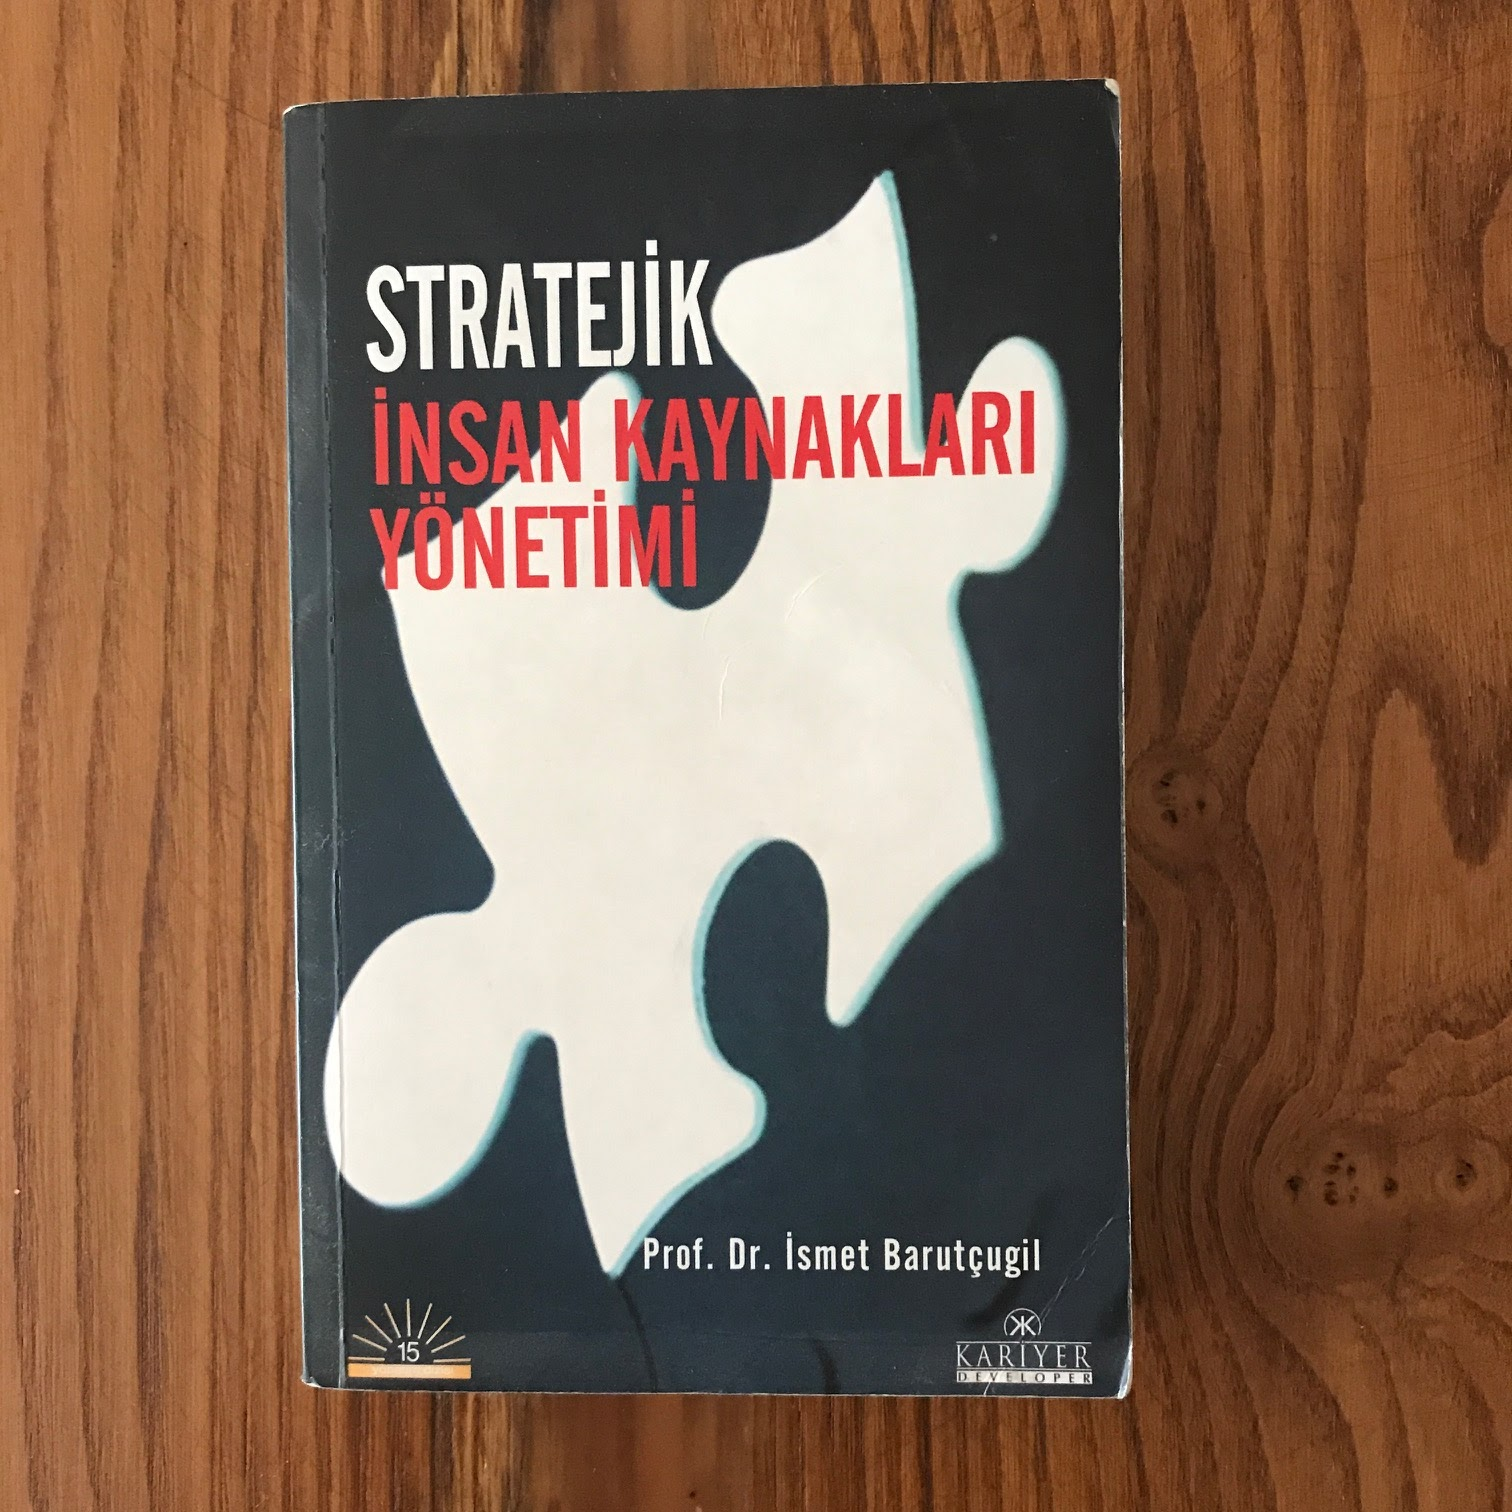 Stratejik Insan Kaynaklari Yonetimi